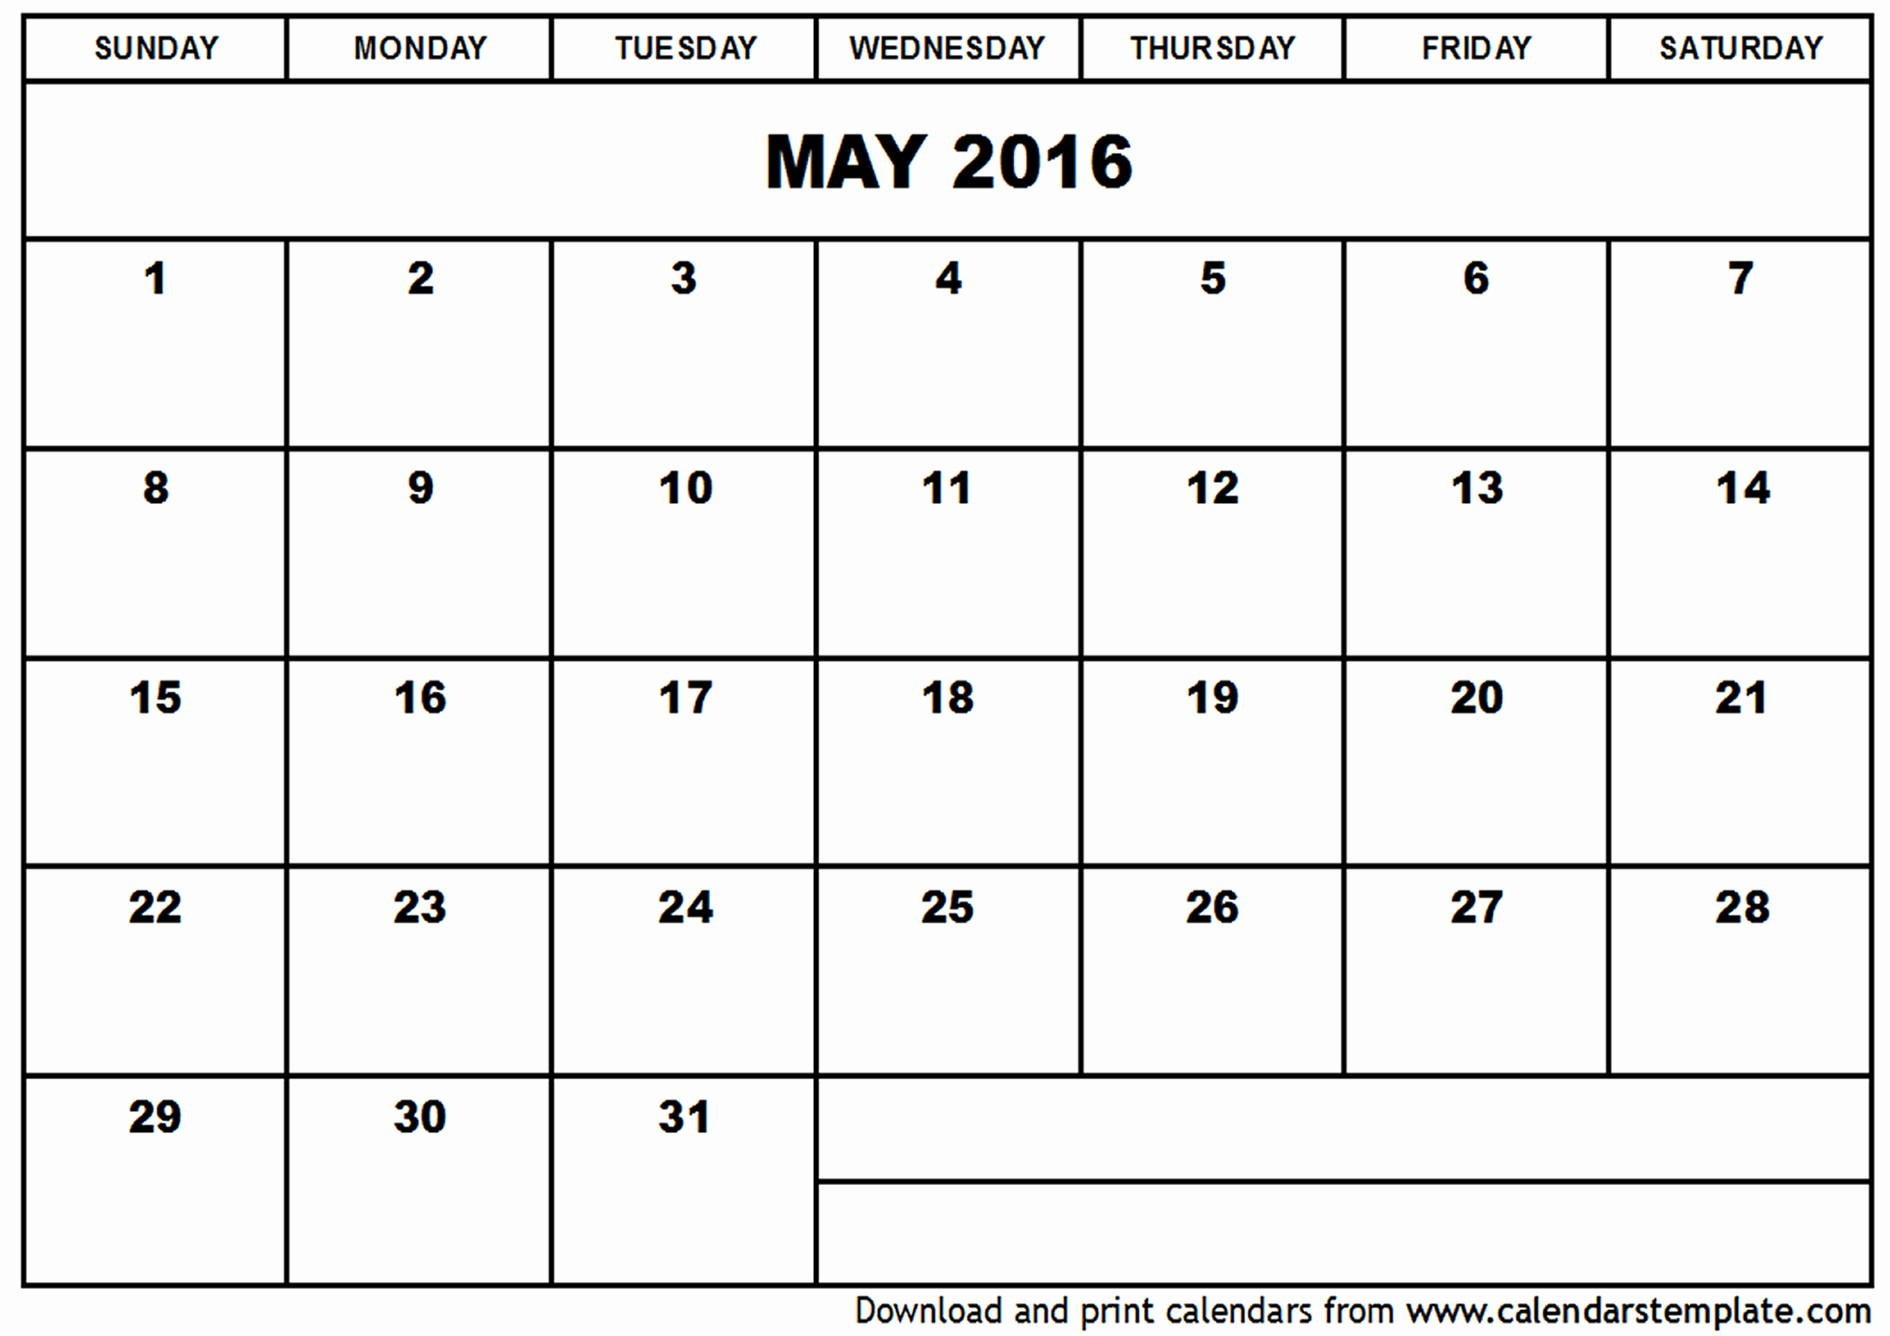 Free Printable Calendars 2016 Templates Fresh May 2016 Calendar Template